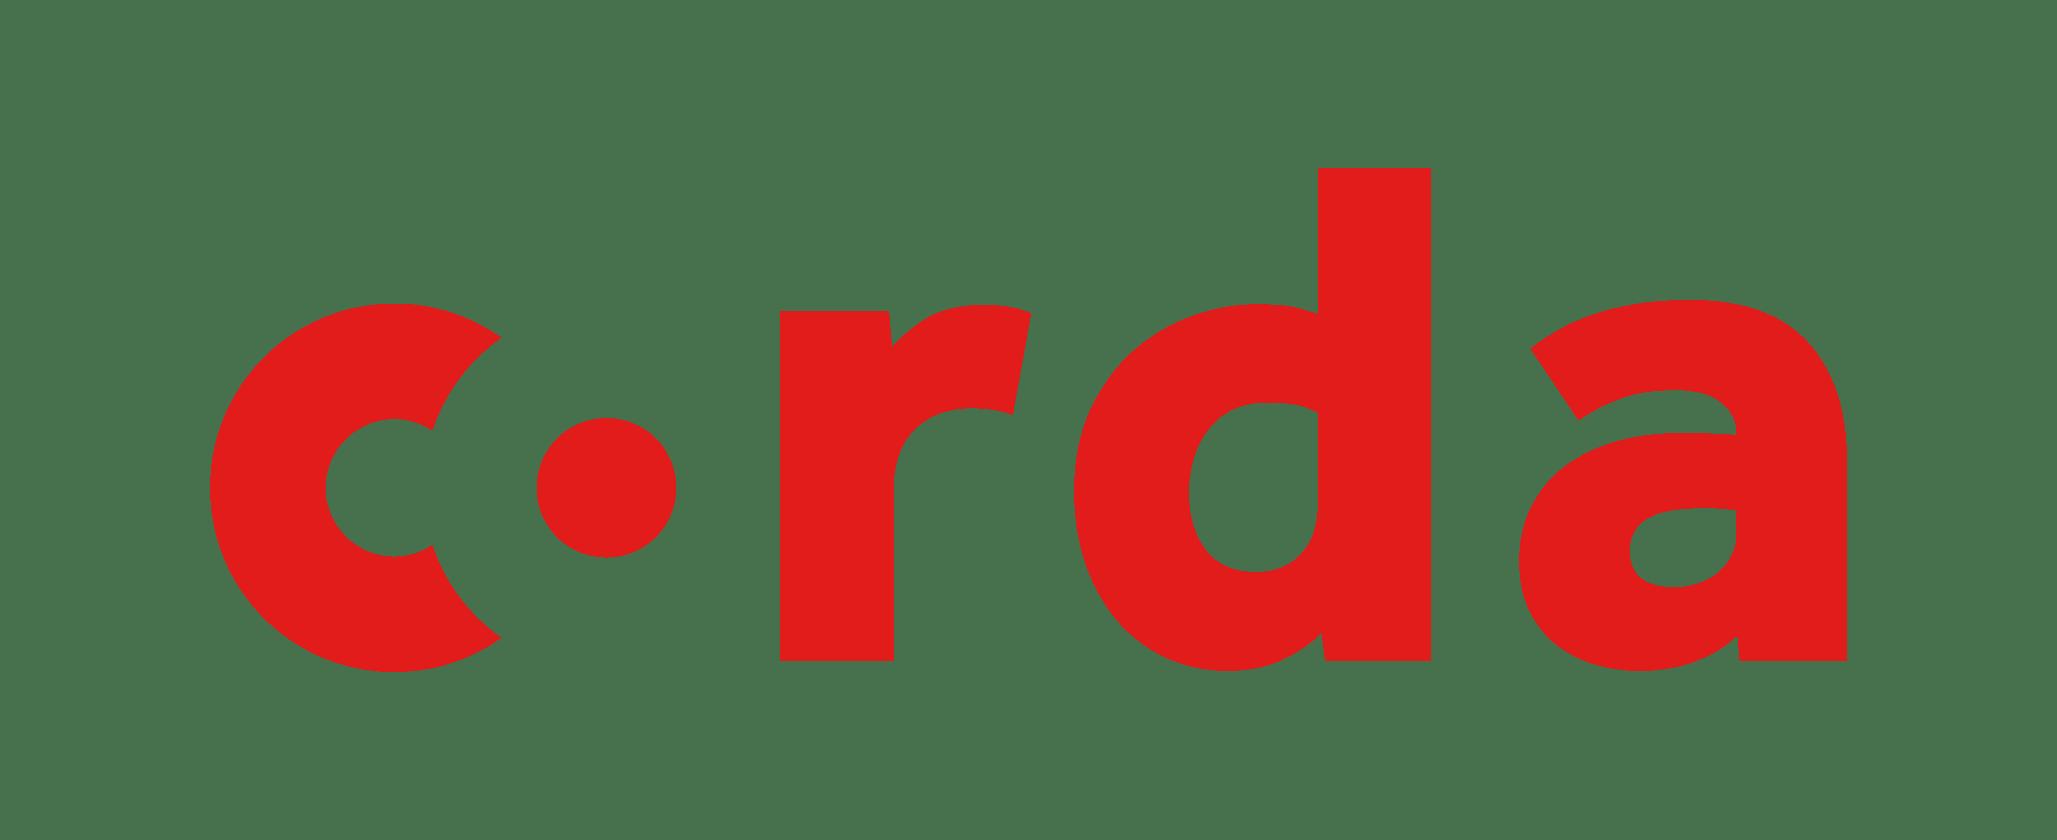 Corda Developer Training - Singapore